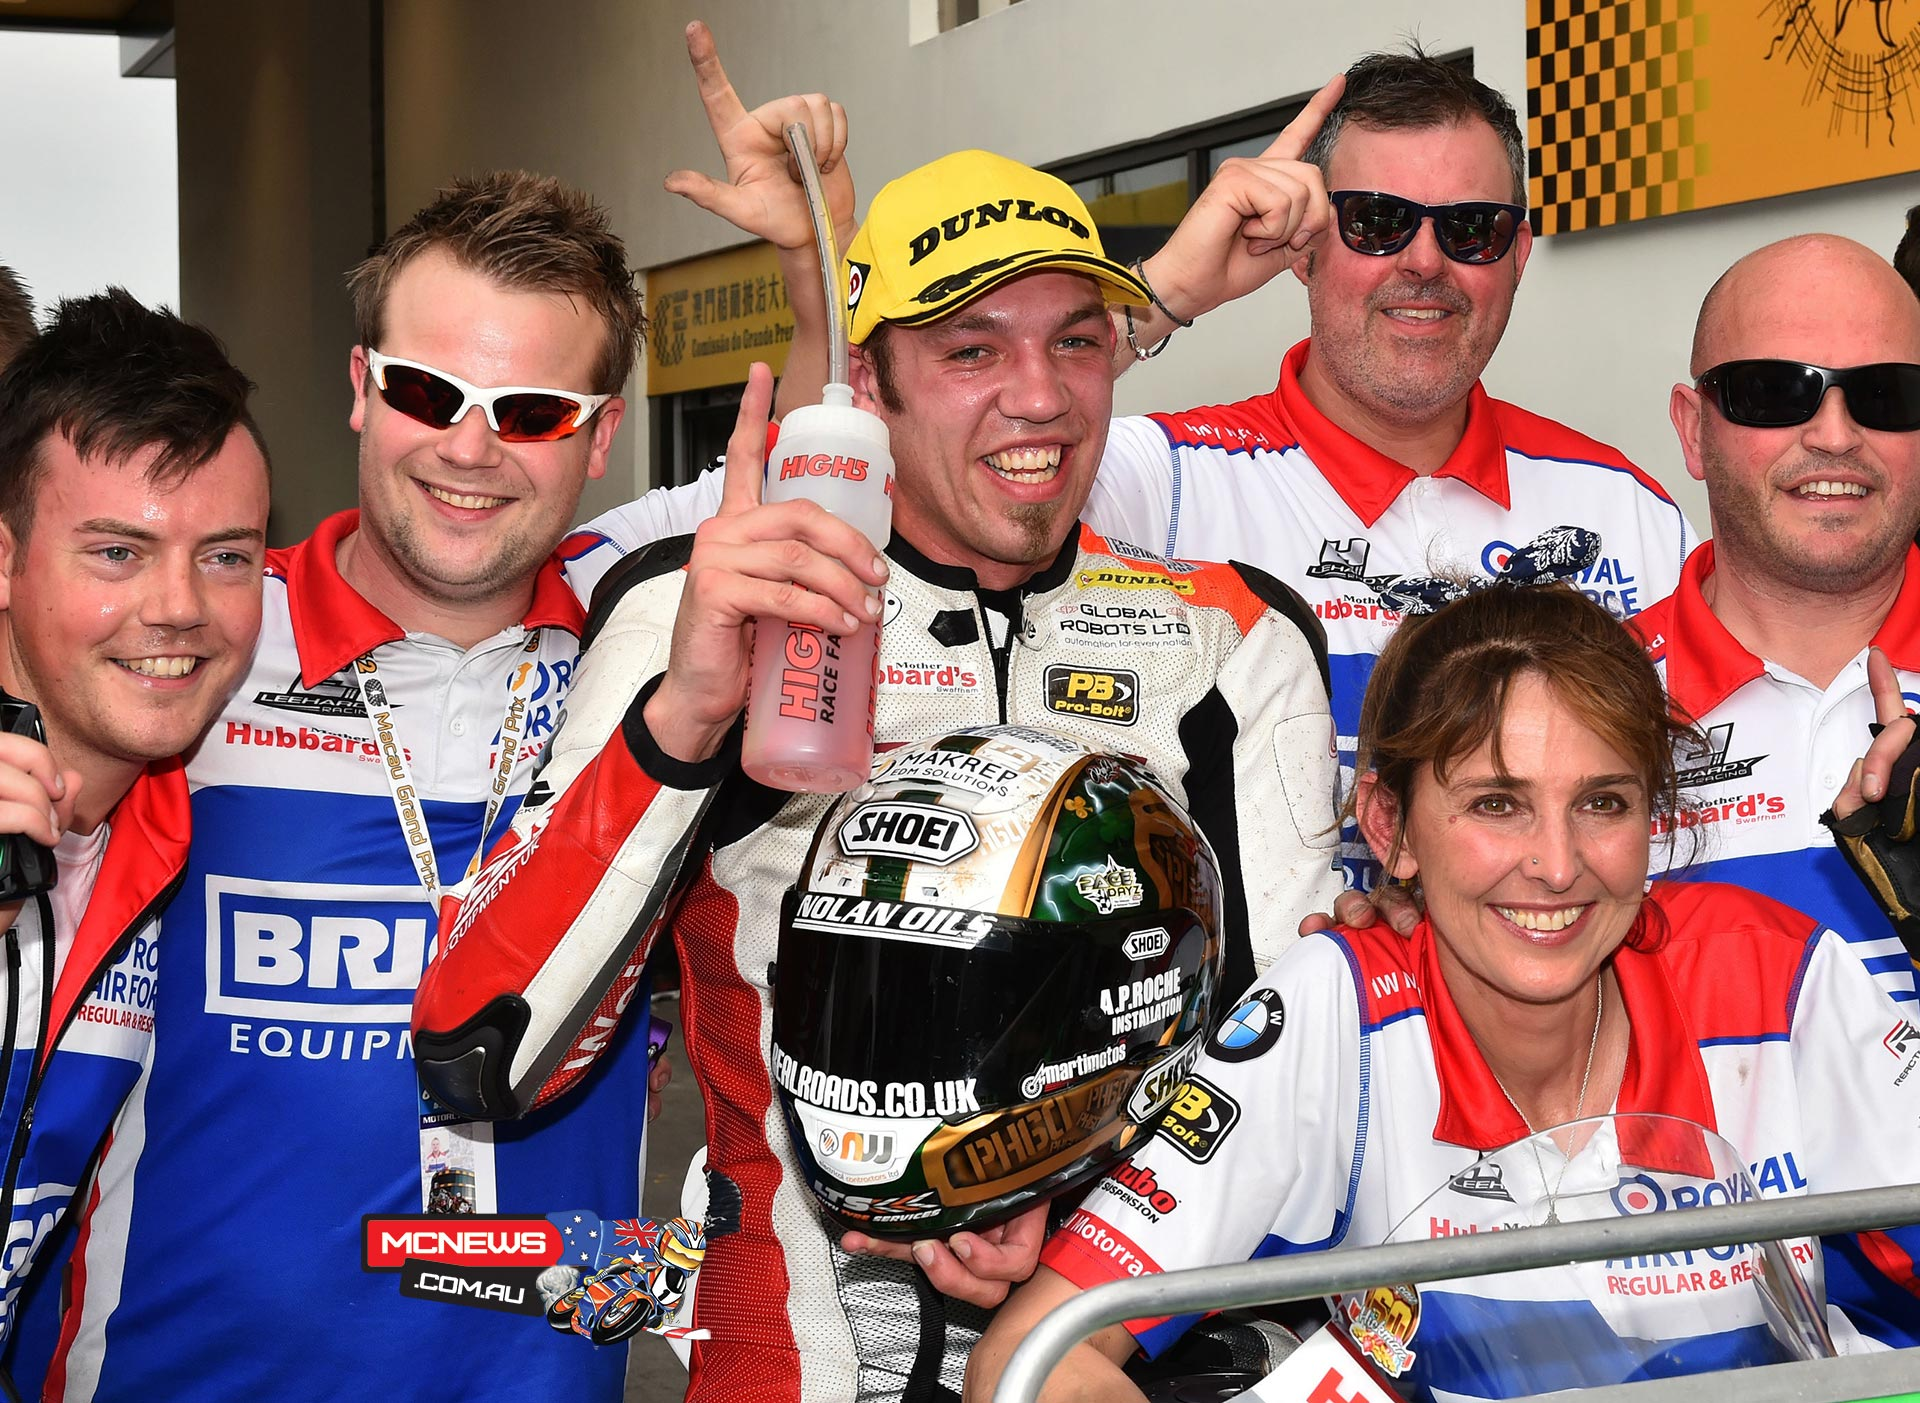 Peter Hickman 2015 Macau Grand Prix winner